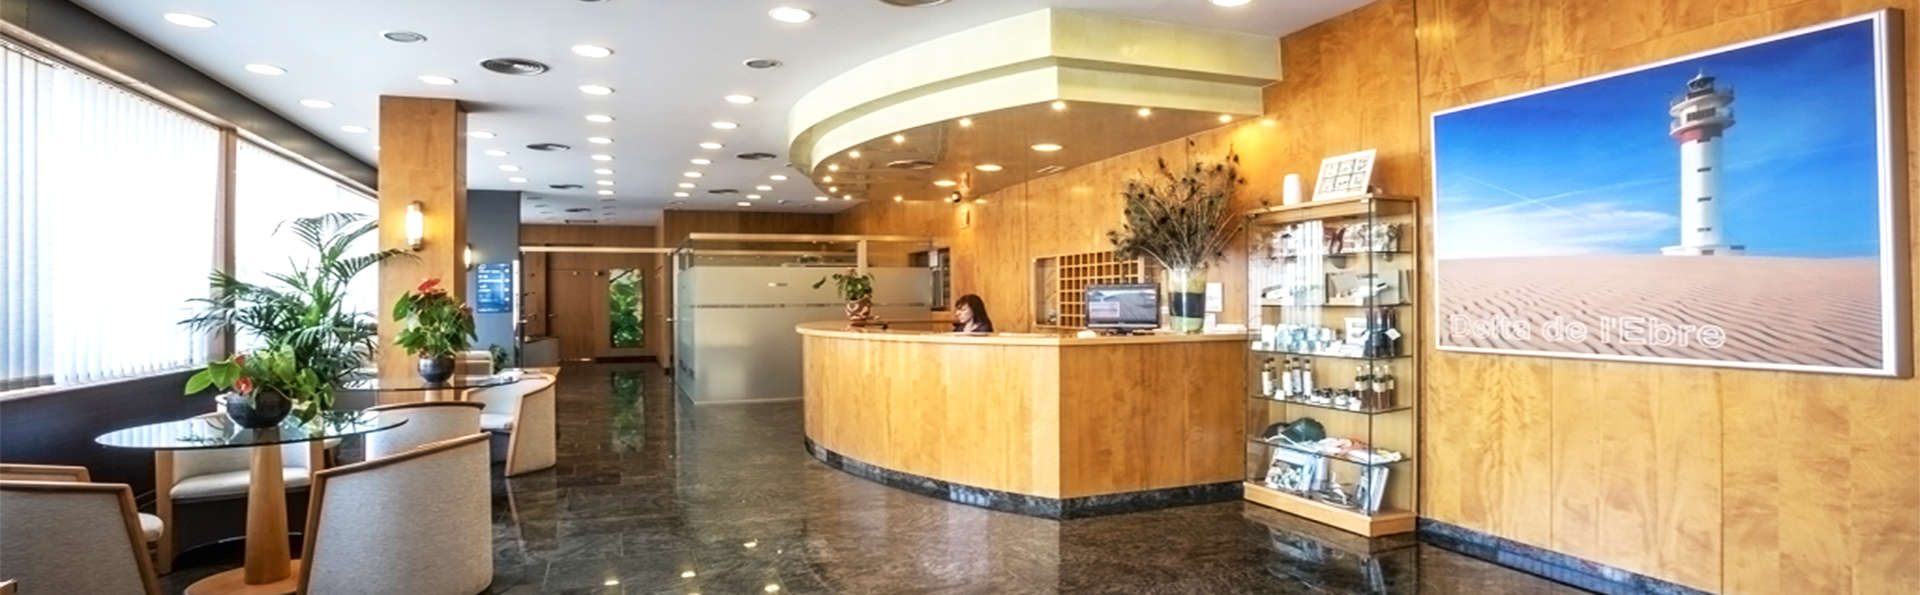 Hotel Rull - EDIT_3_recepcion.jpg